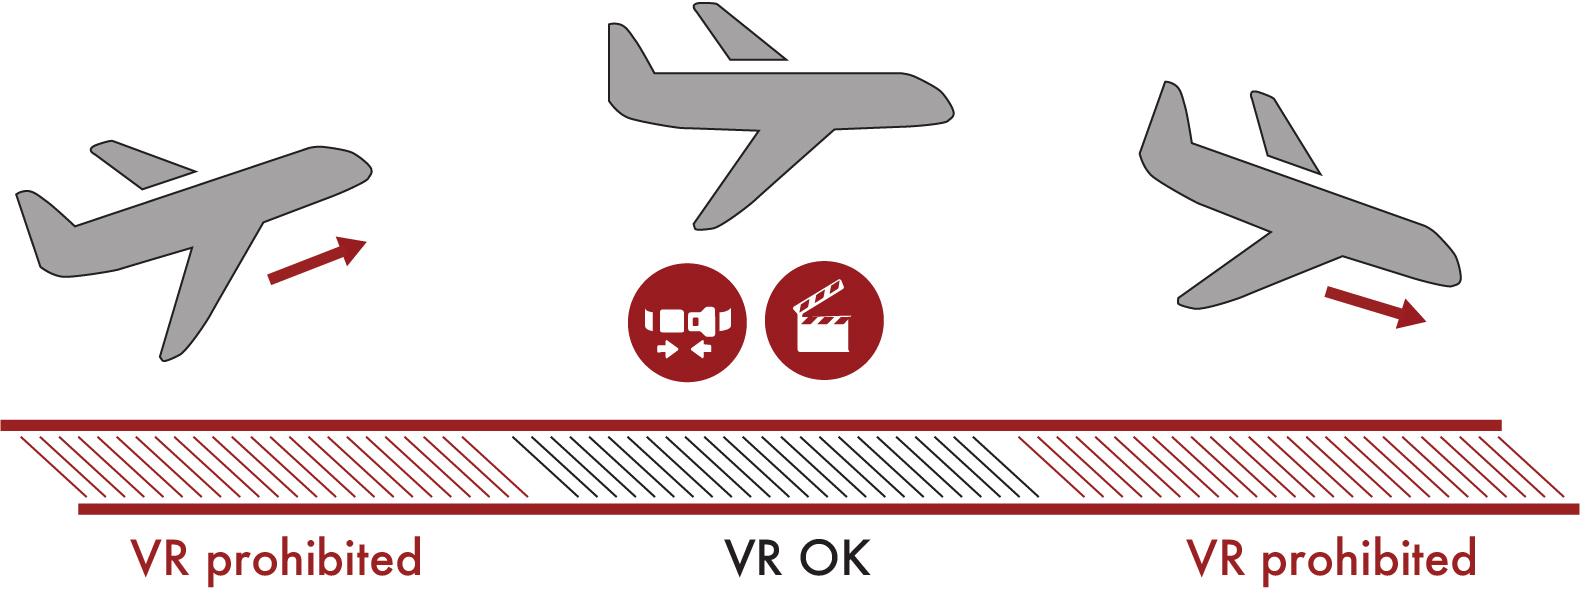 Cruising altitude VR IFE safety protocol-04.jpg